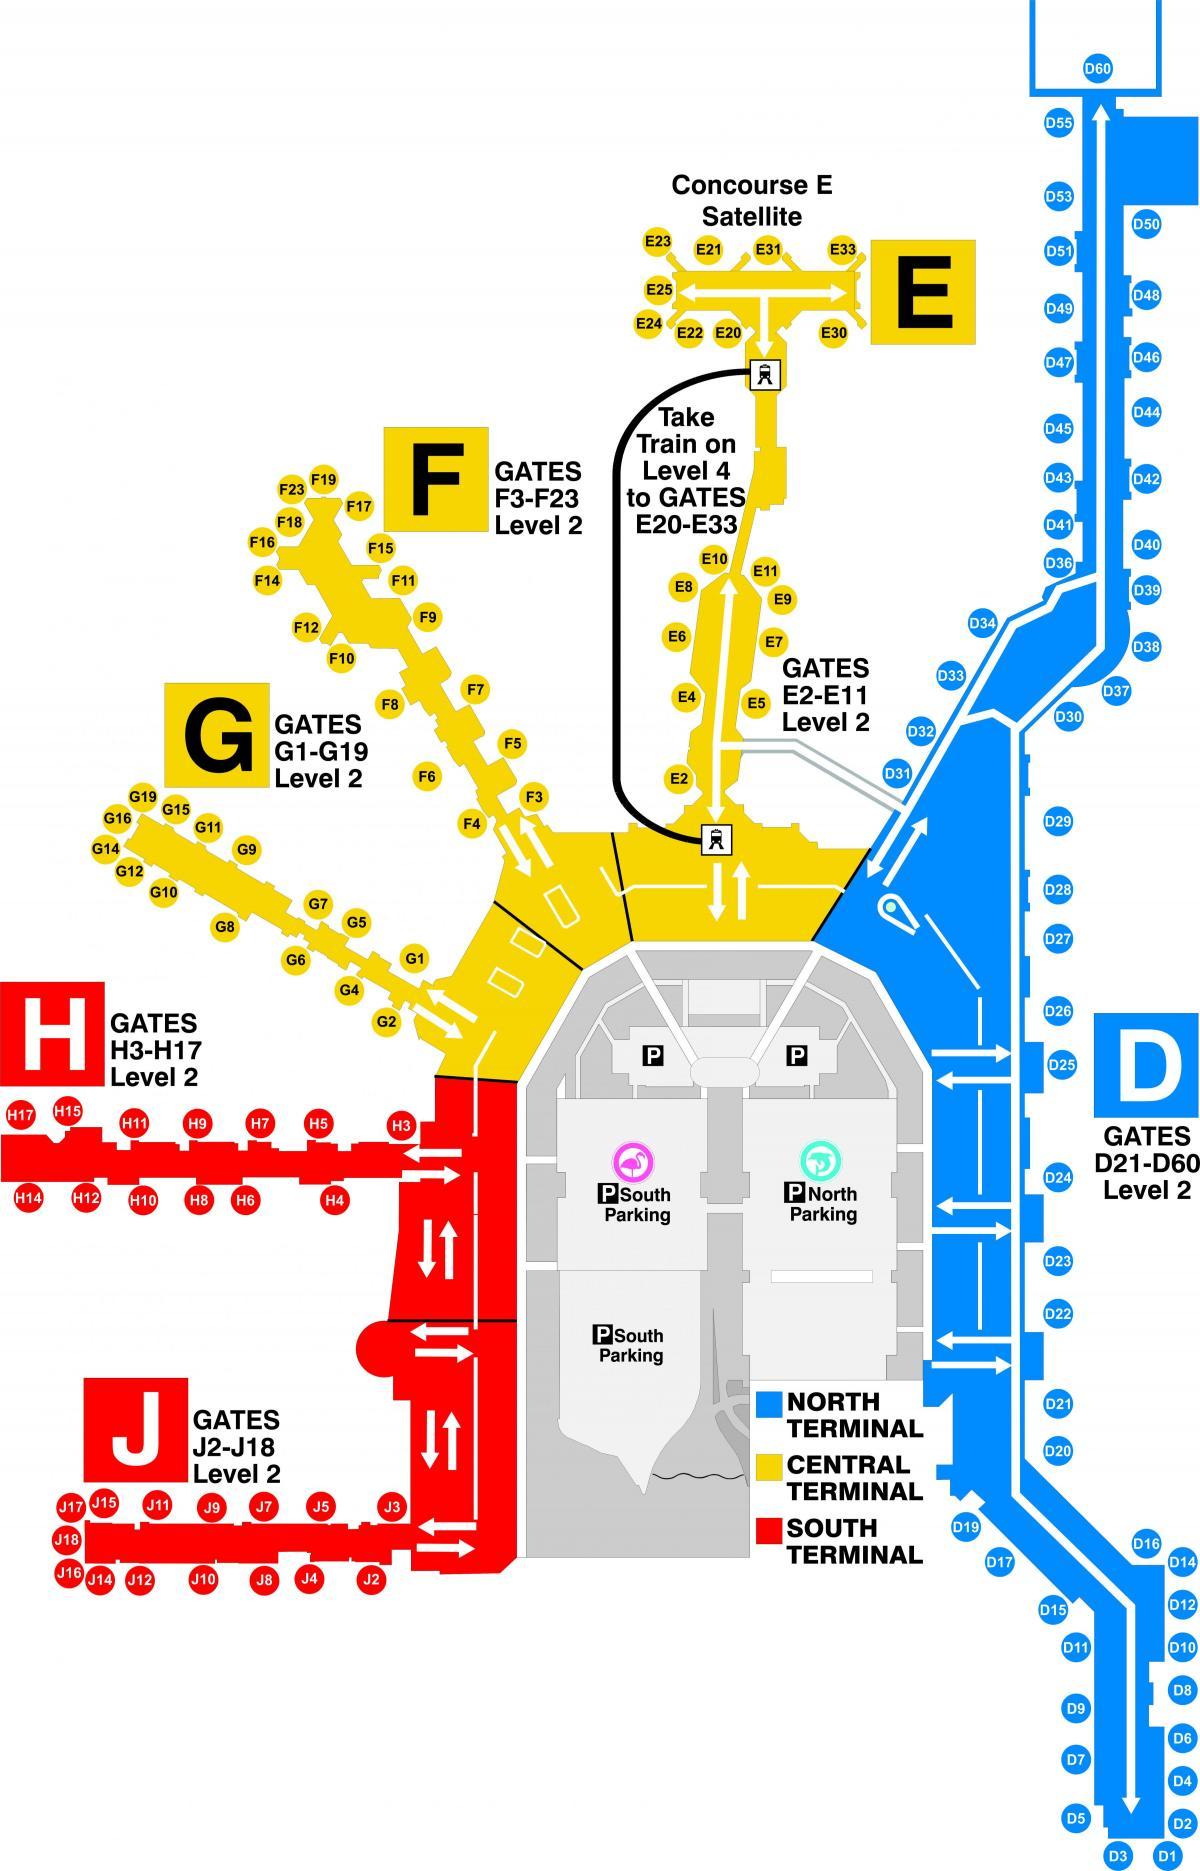 Miami Airport Map Map Of Miami Airport Florida USA - Mapa florida usa